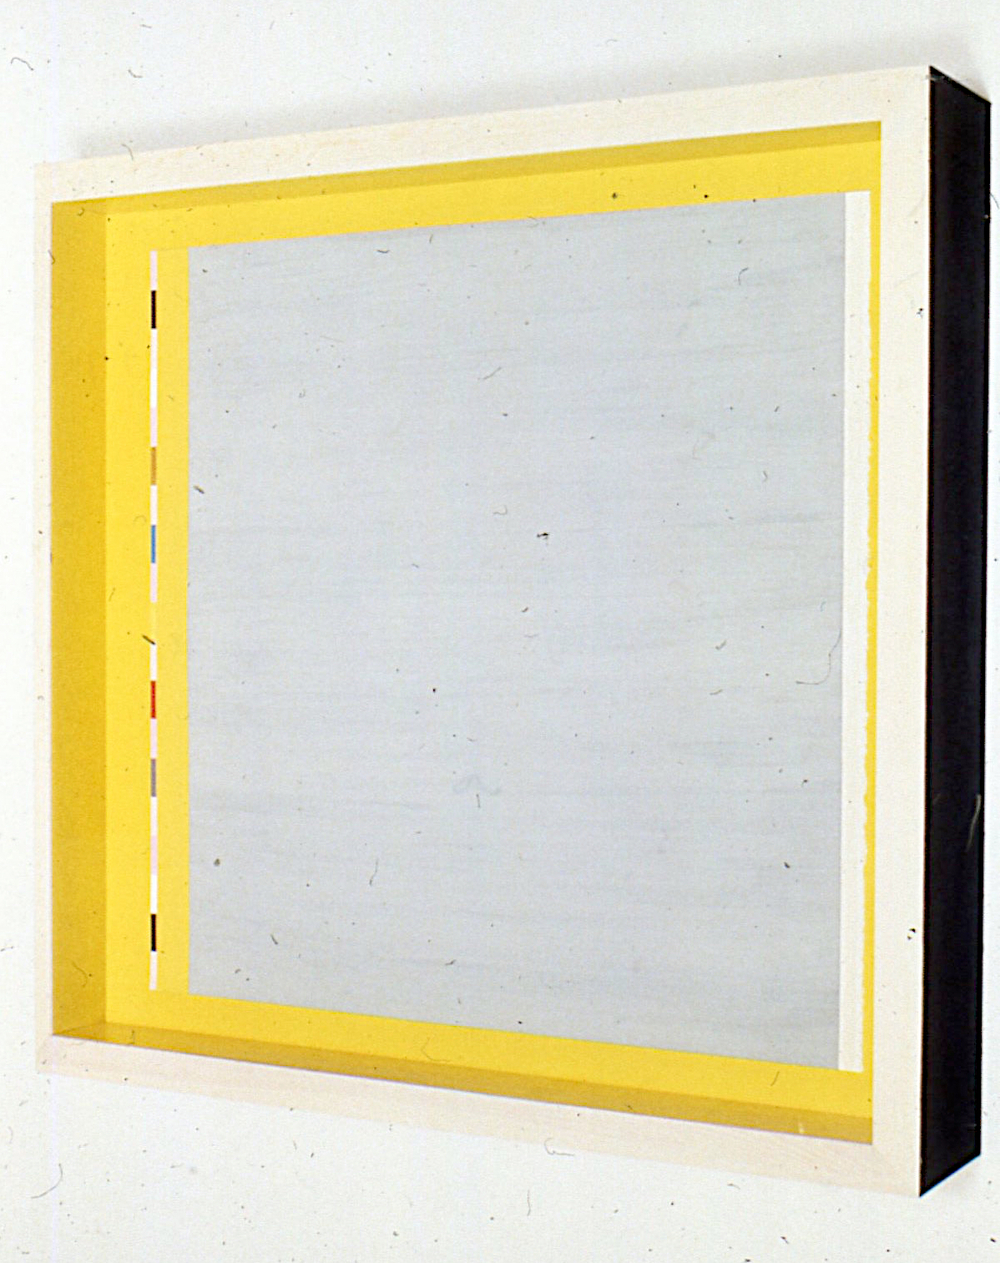 JGR. 1988. Borgenicht Gallery3.jpg